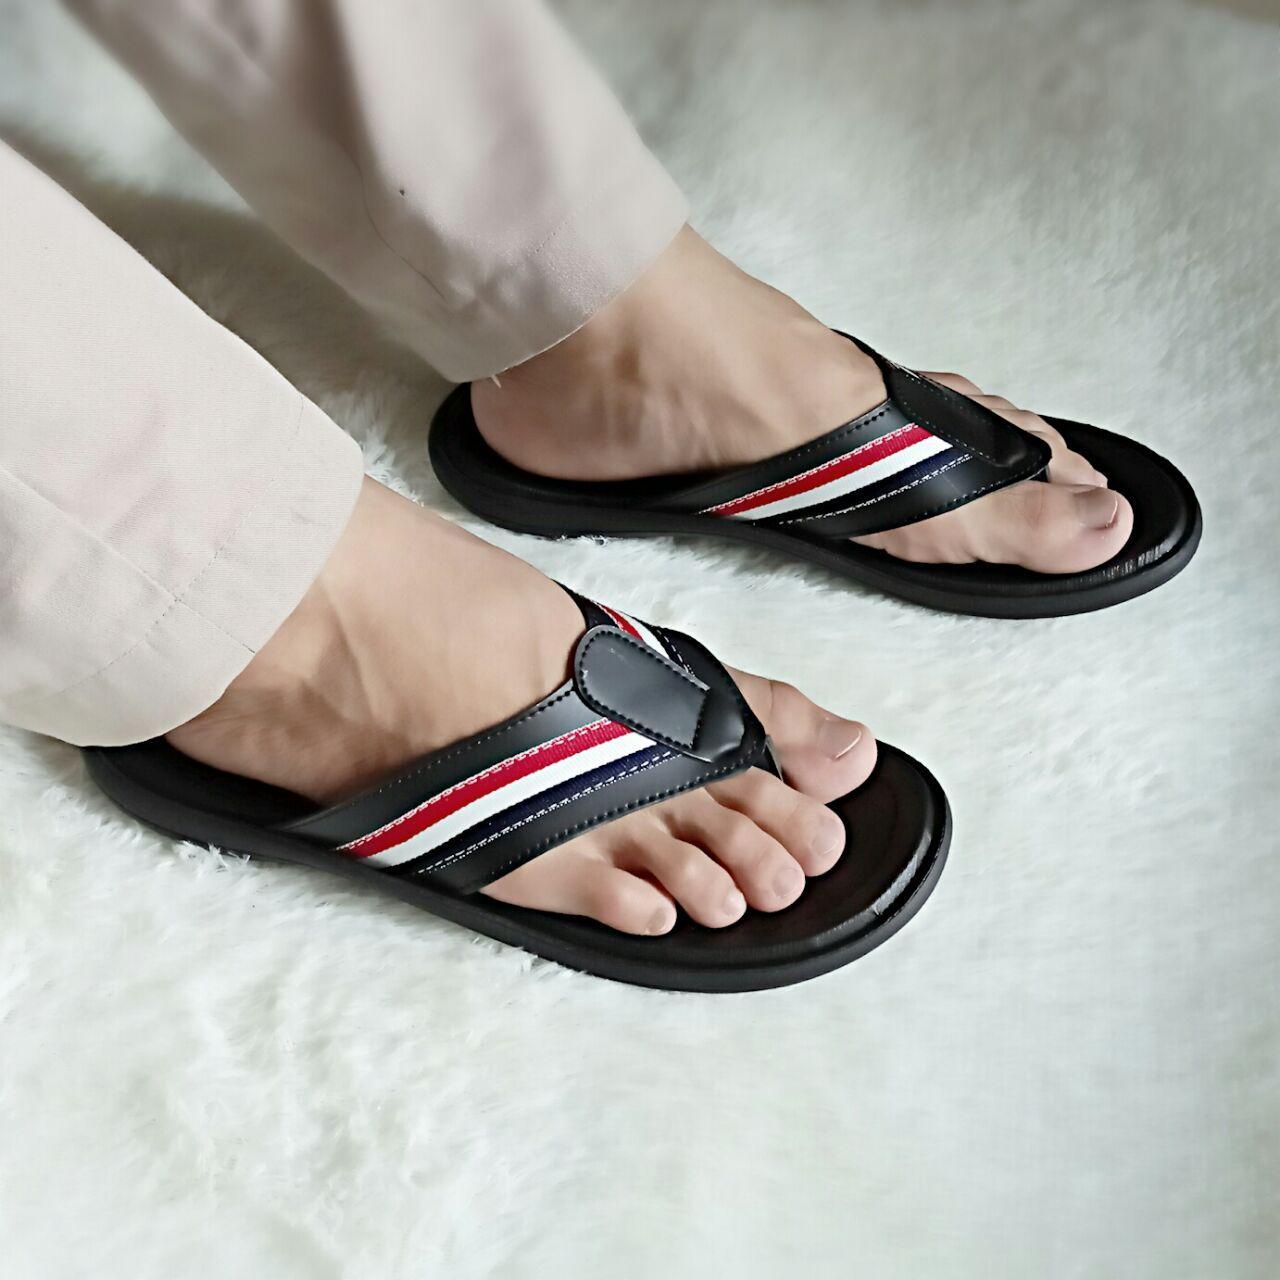 The Purba's Sandal Pria TP.02